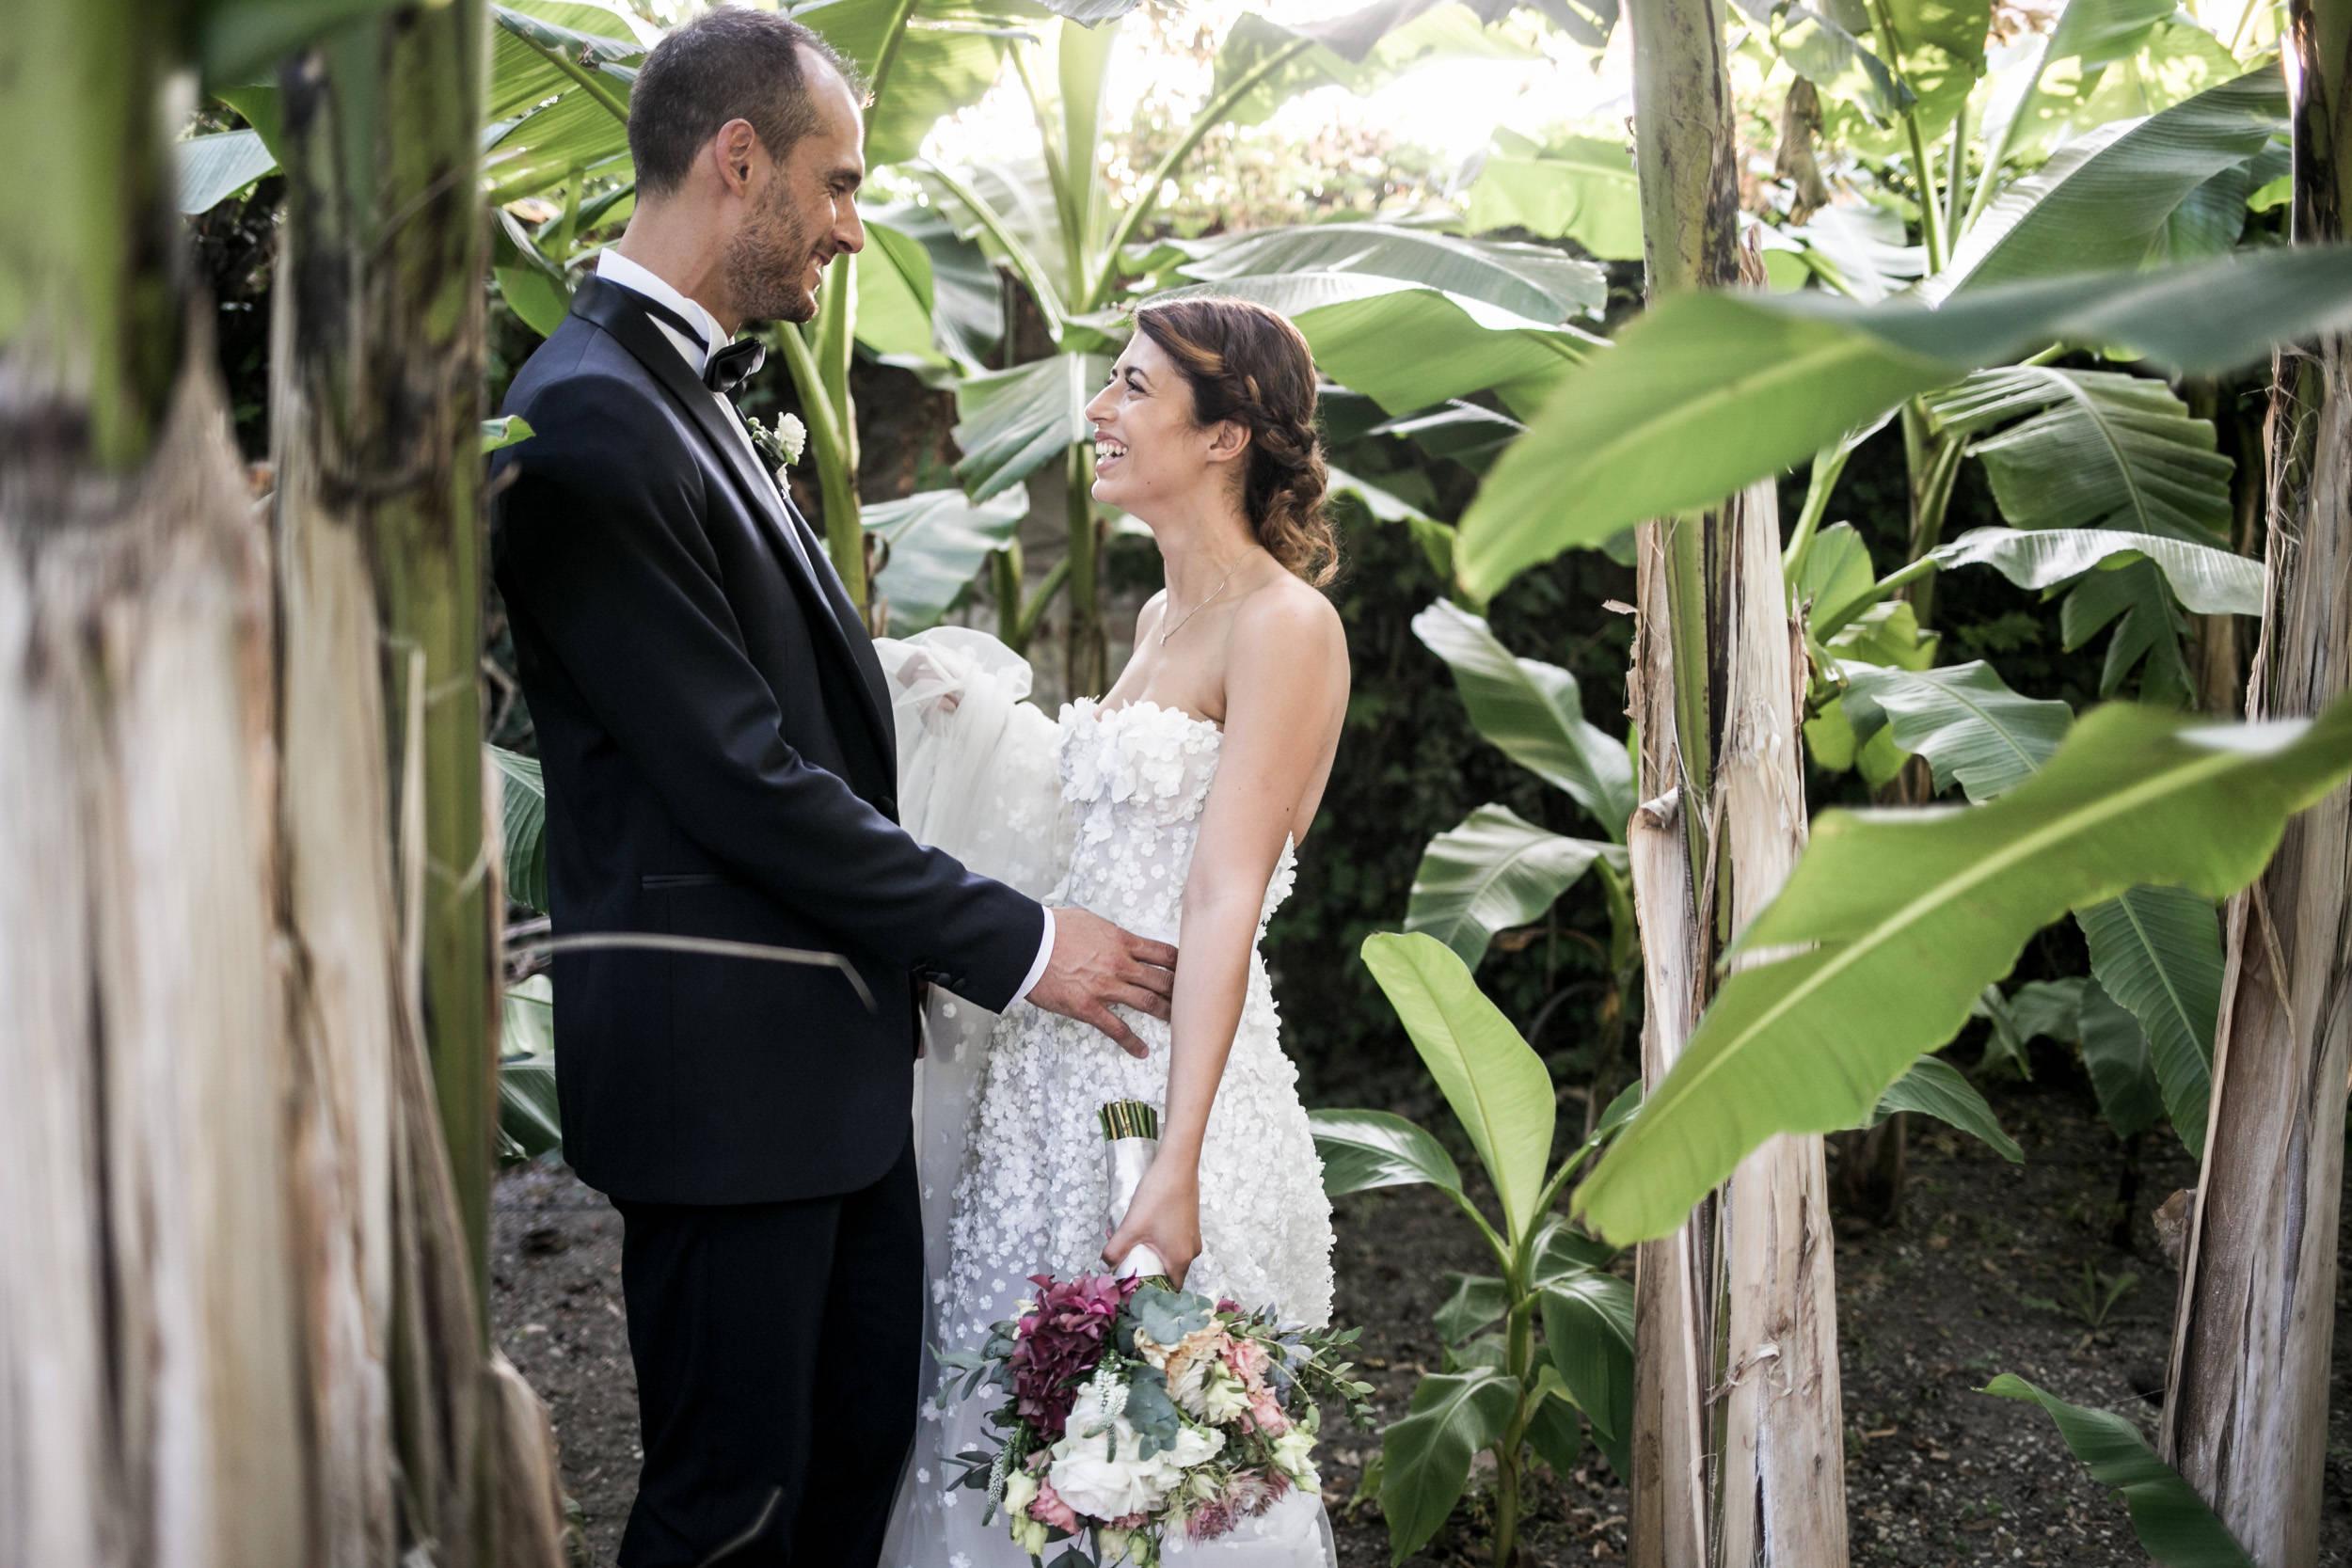 matrimonio_villa-ferrari-gussola_MI-079